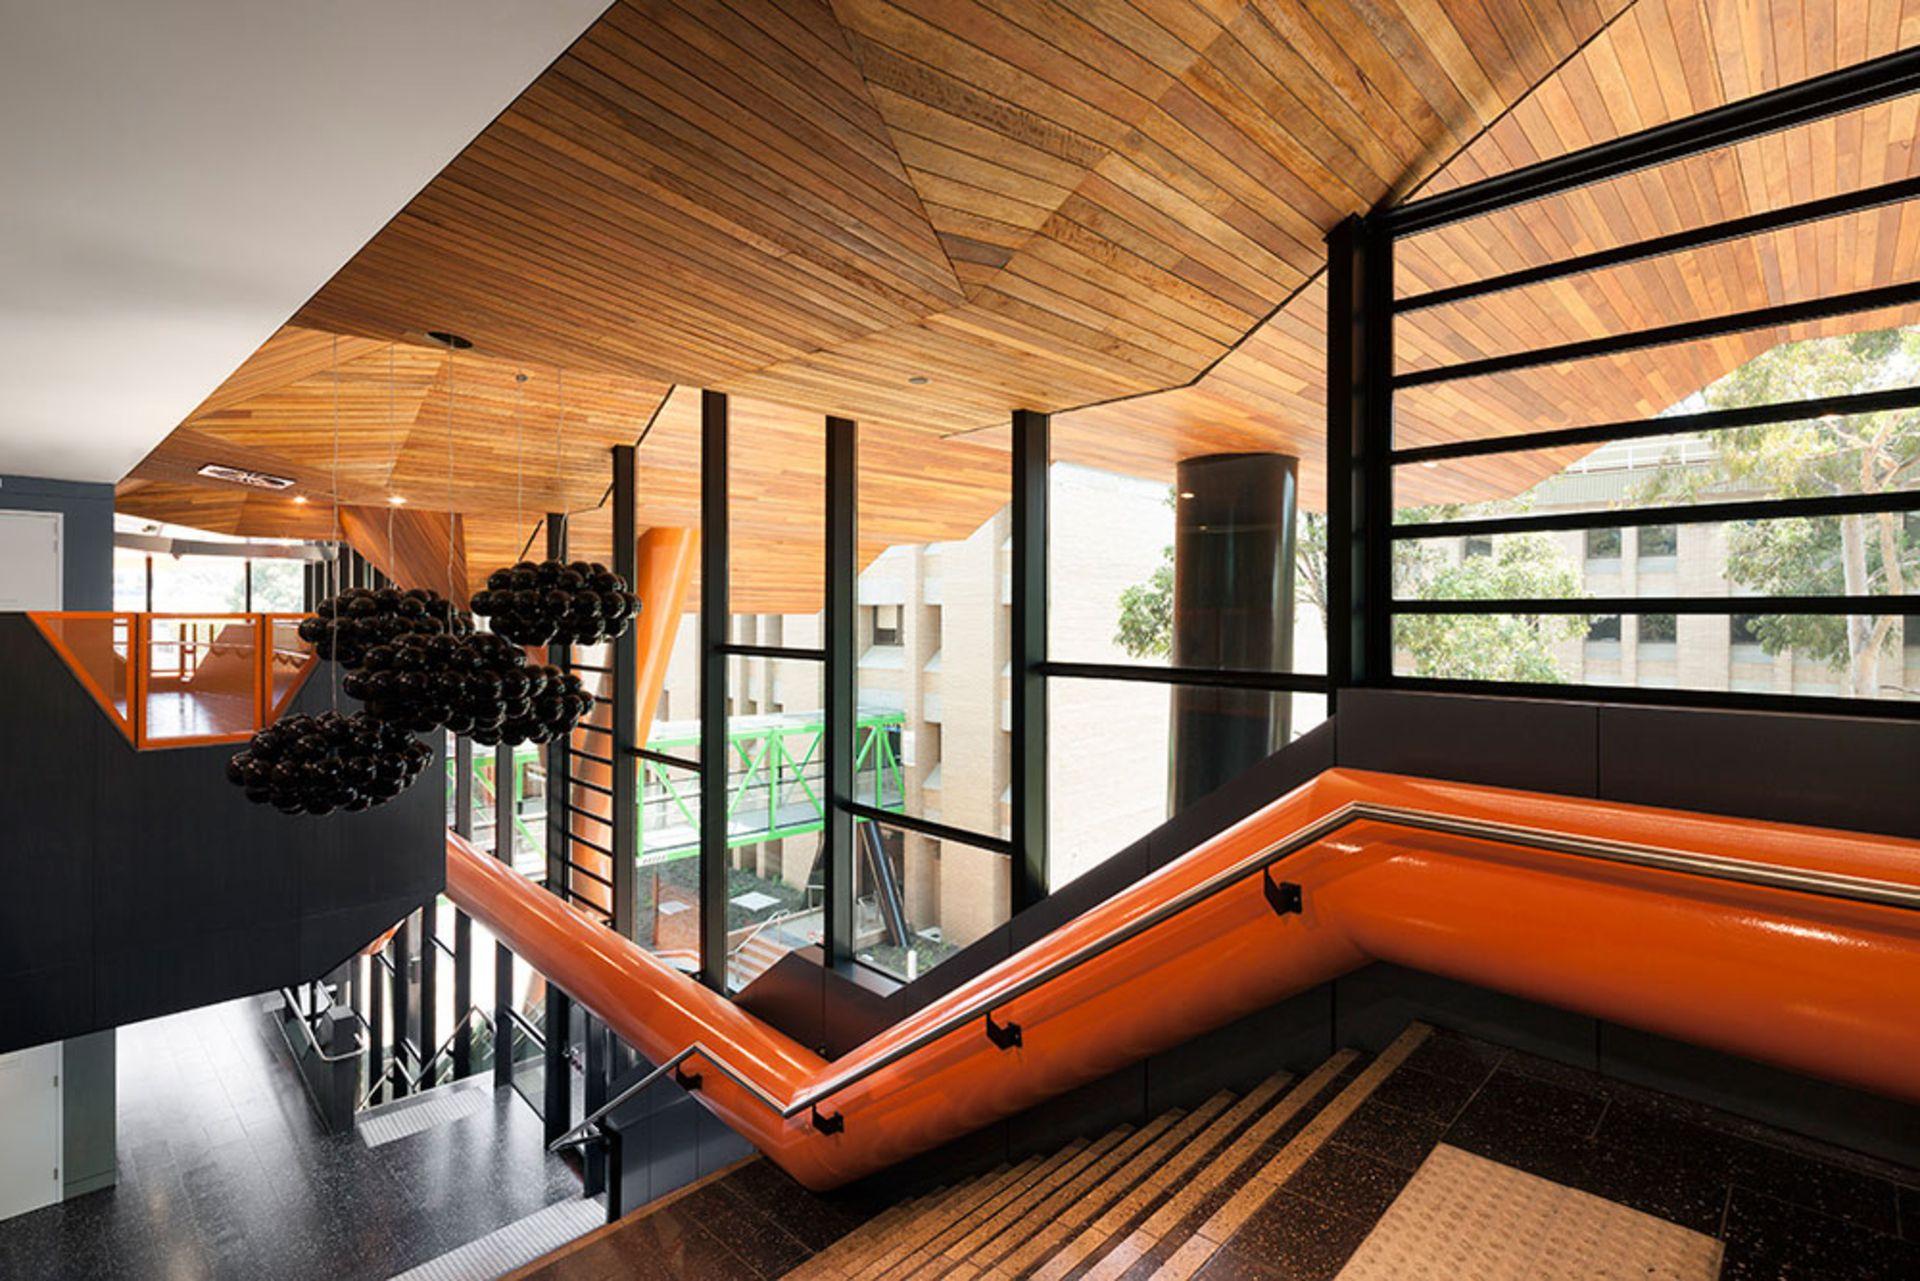 Modern university interior design back to school design inspirations pinterest school Top universities for interior design